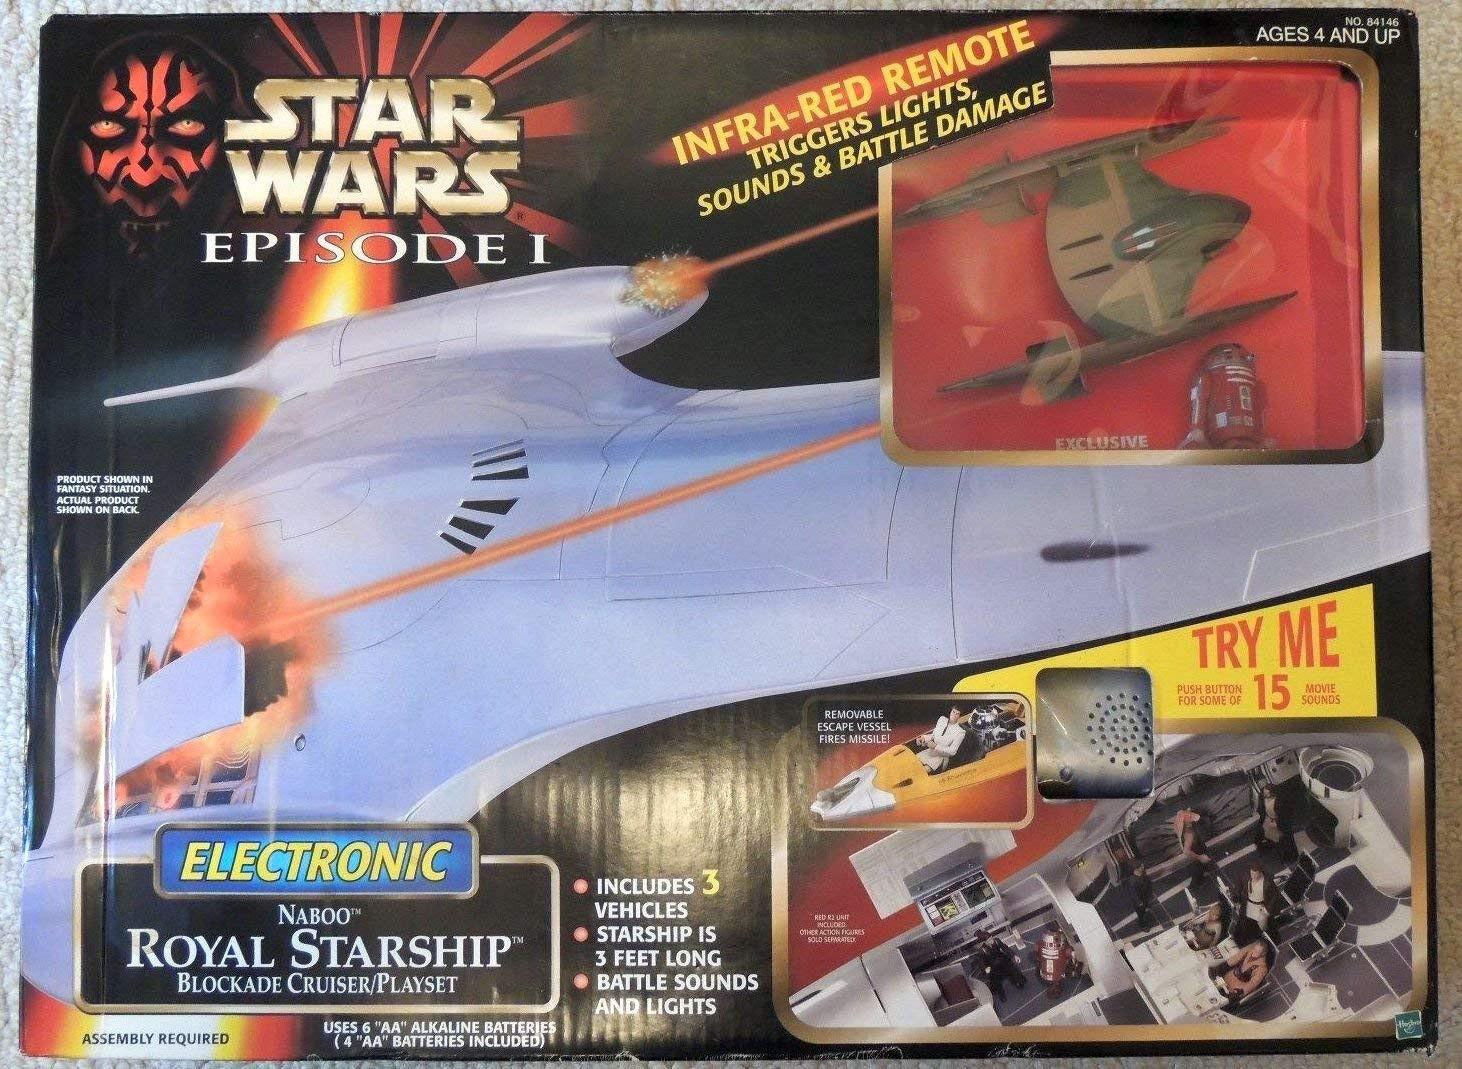 Star Wars Ep1 Reina Amidala Royal Starship bloqueo Cruiser